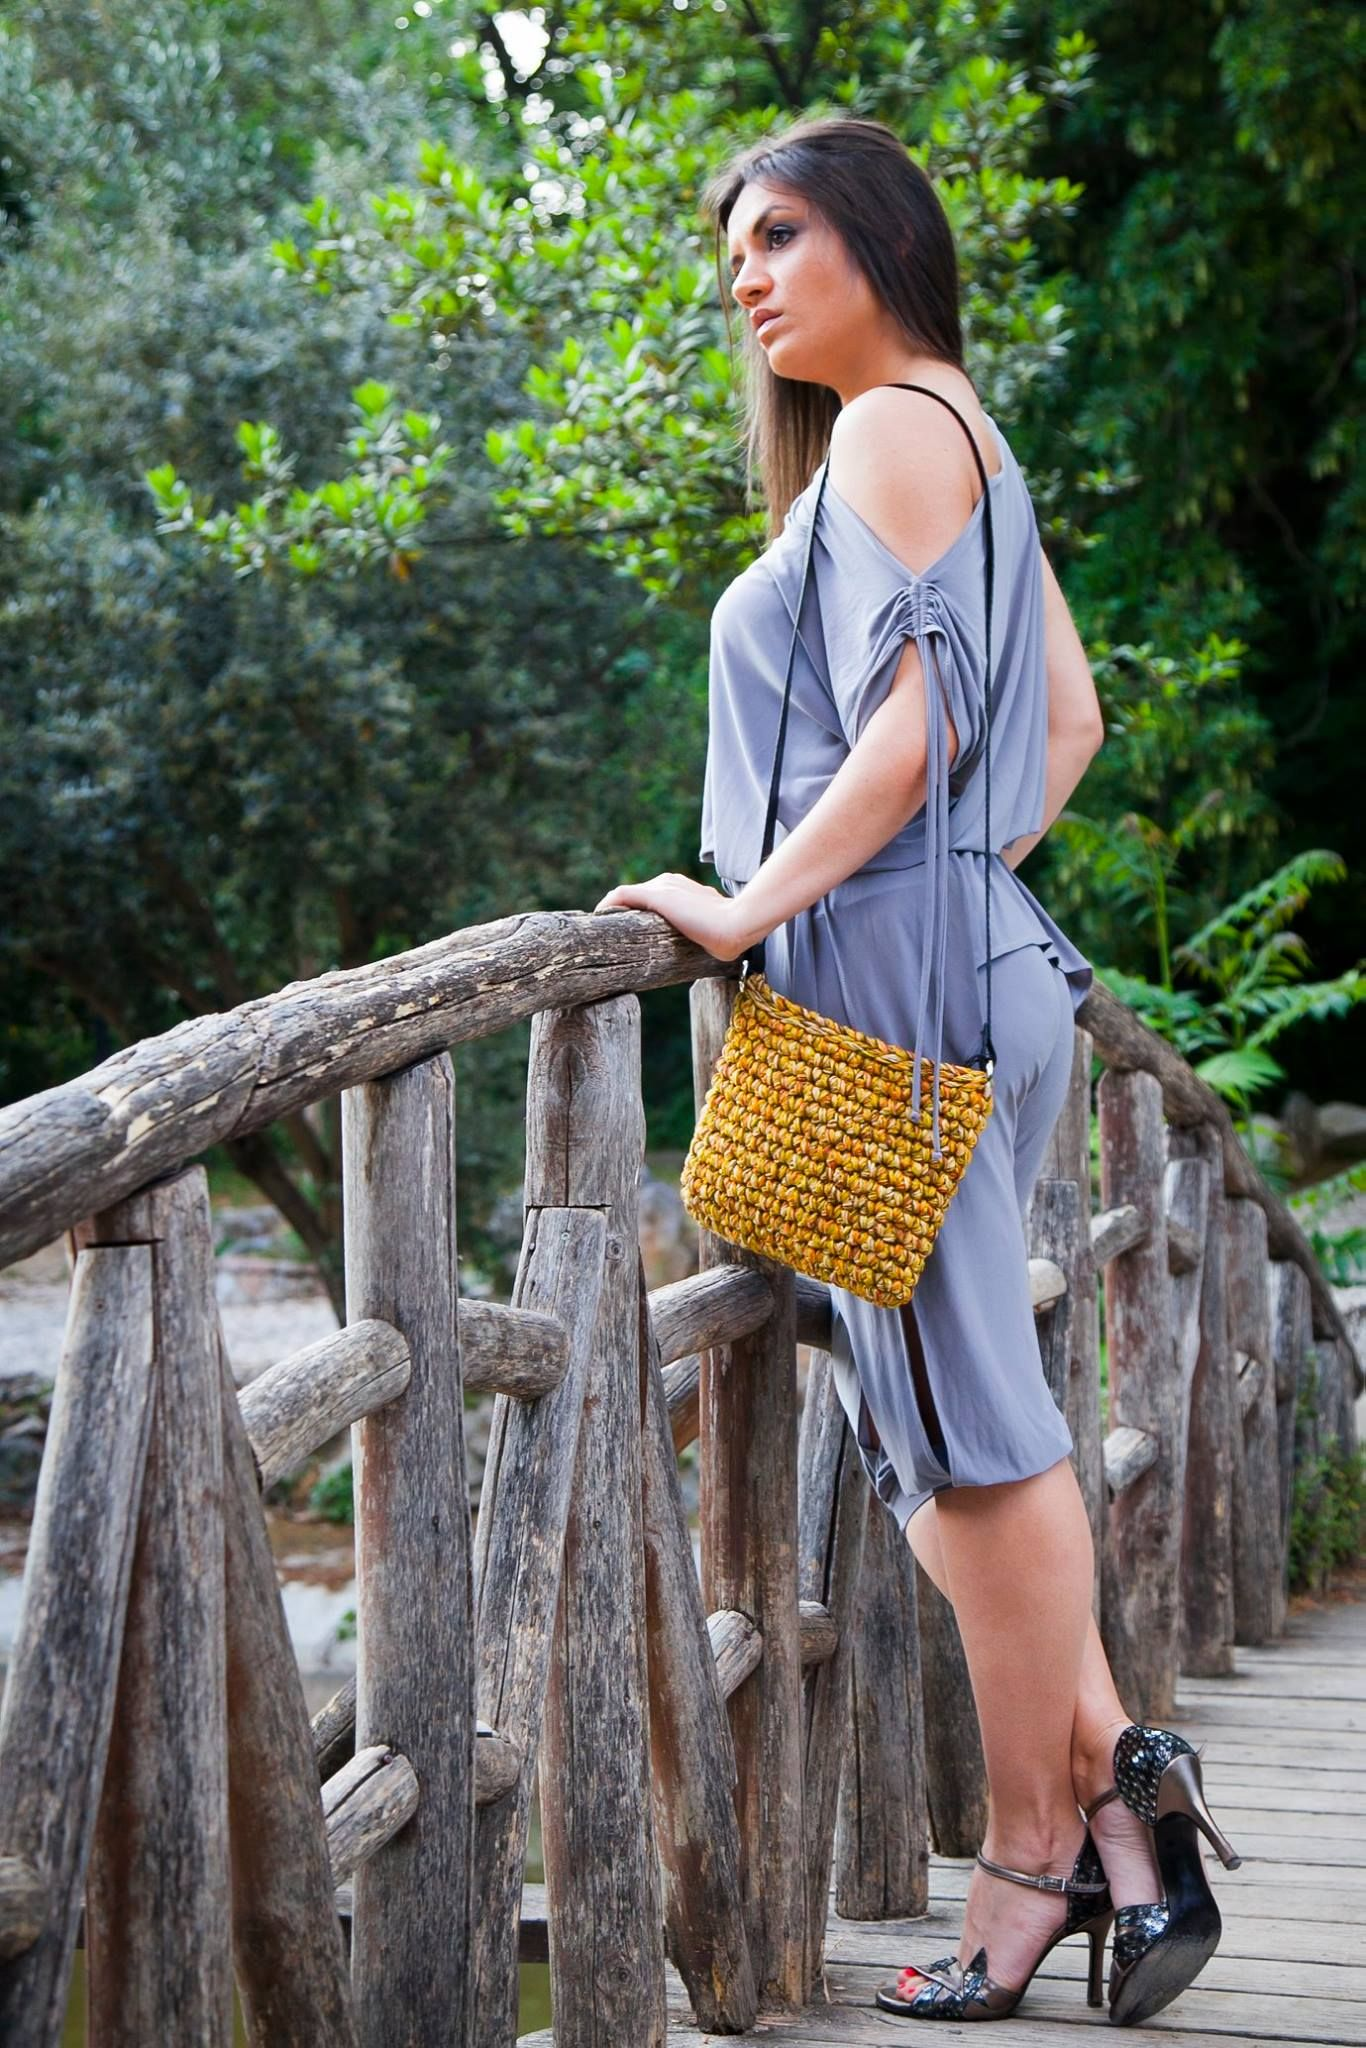 Handmade crocheted crossbody bag